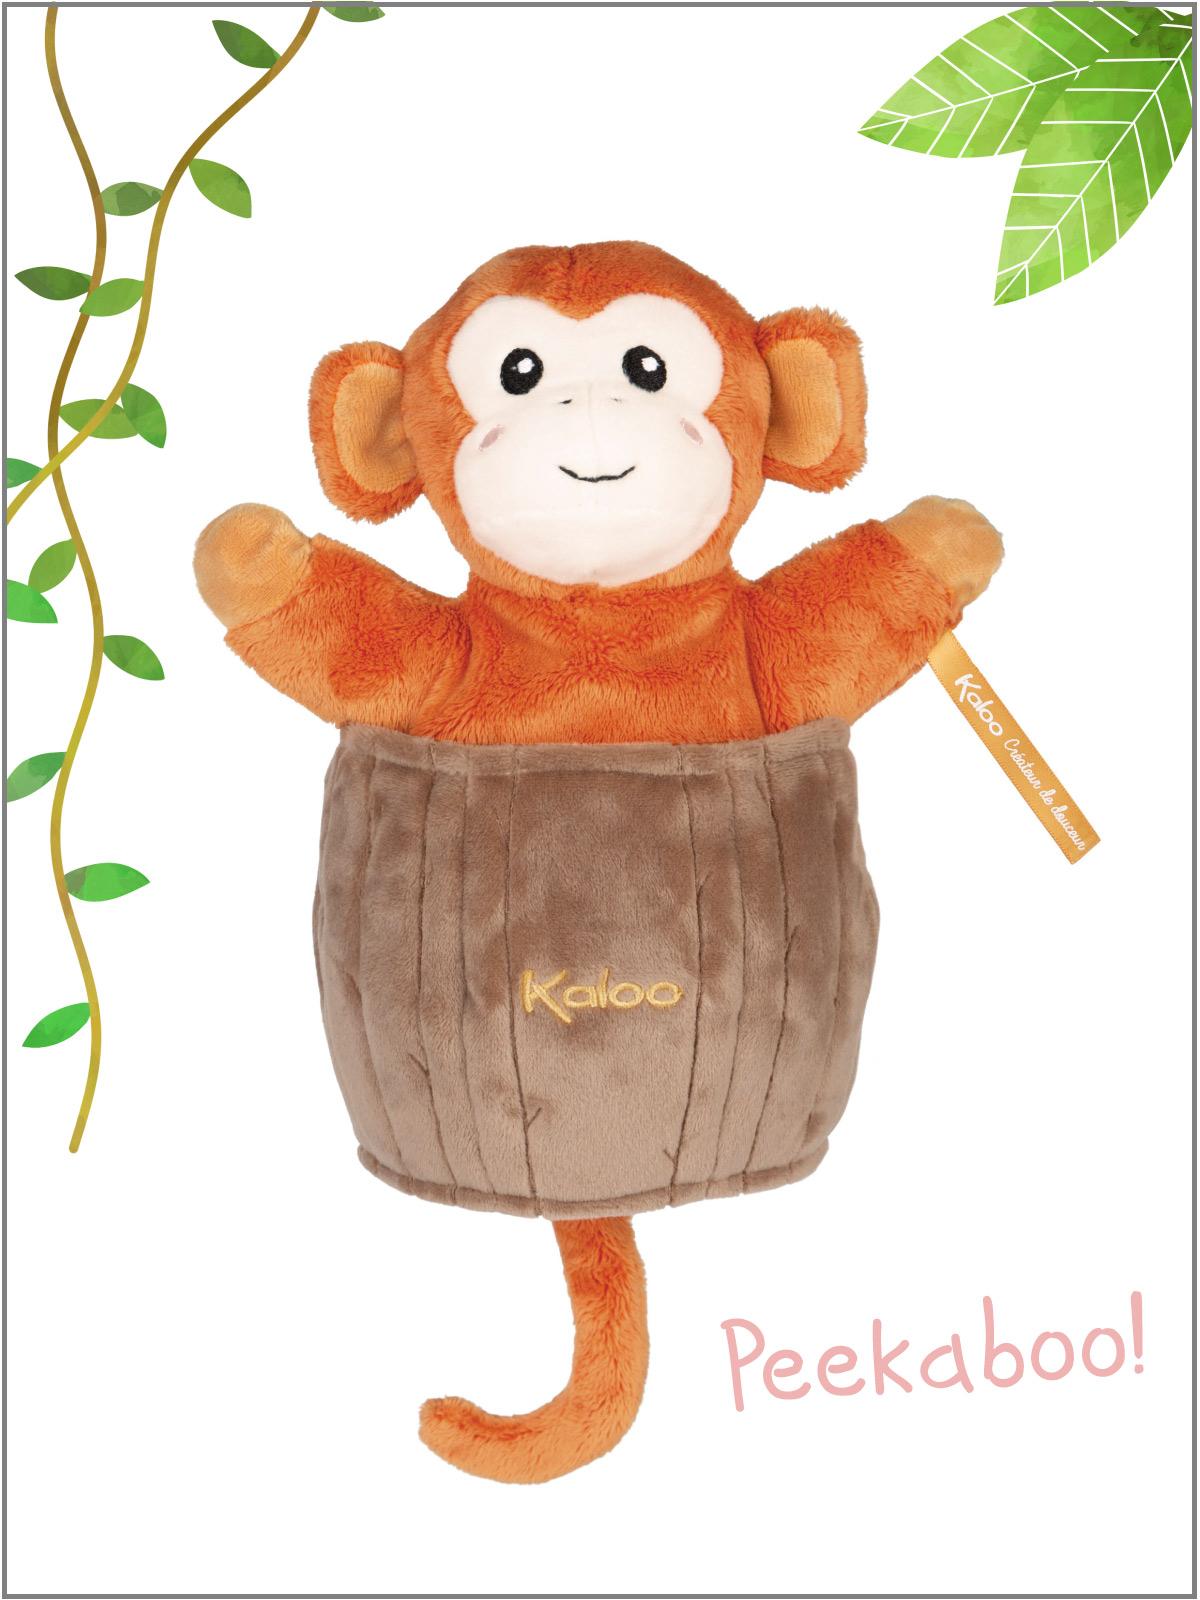 frederickandsophie-kids-toys-kaloo-france-monkey-handpuppet-jungle-peekaboo